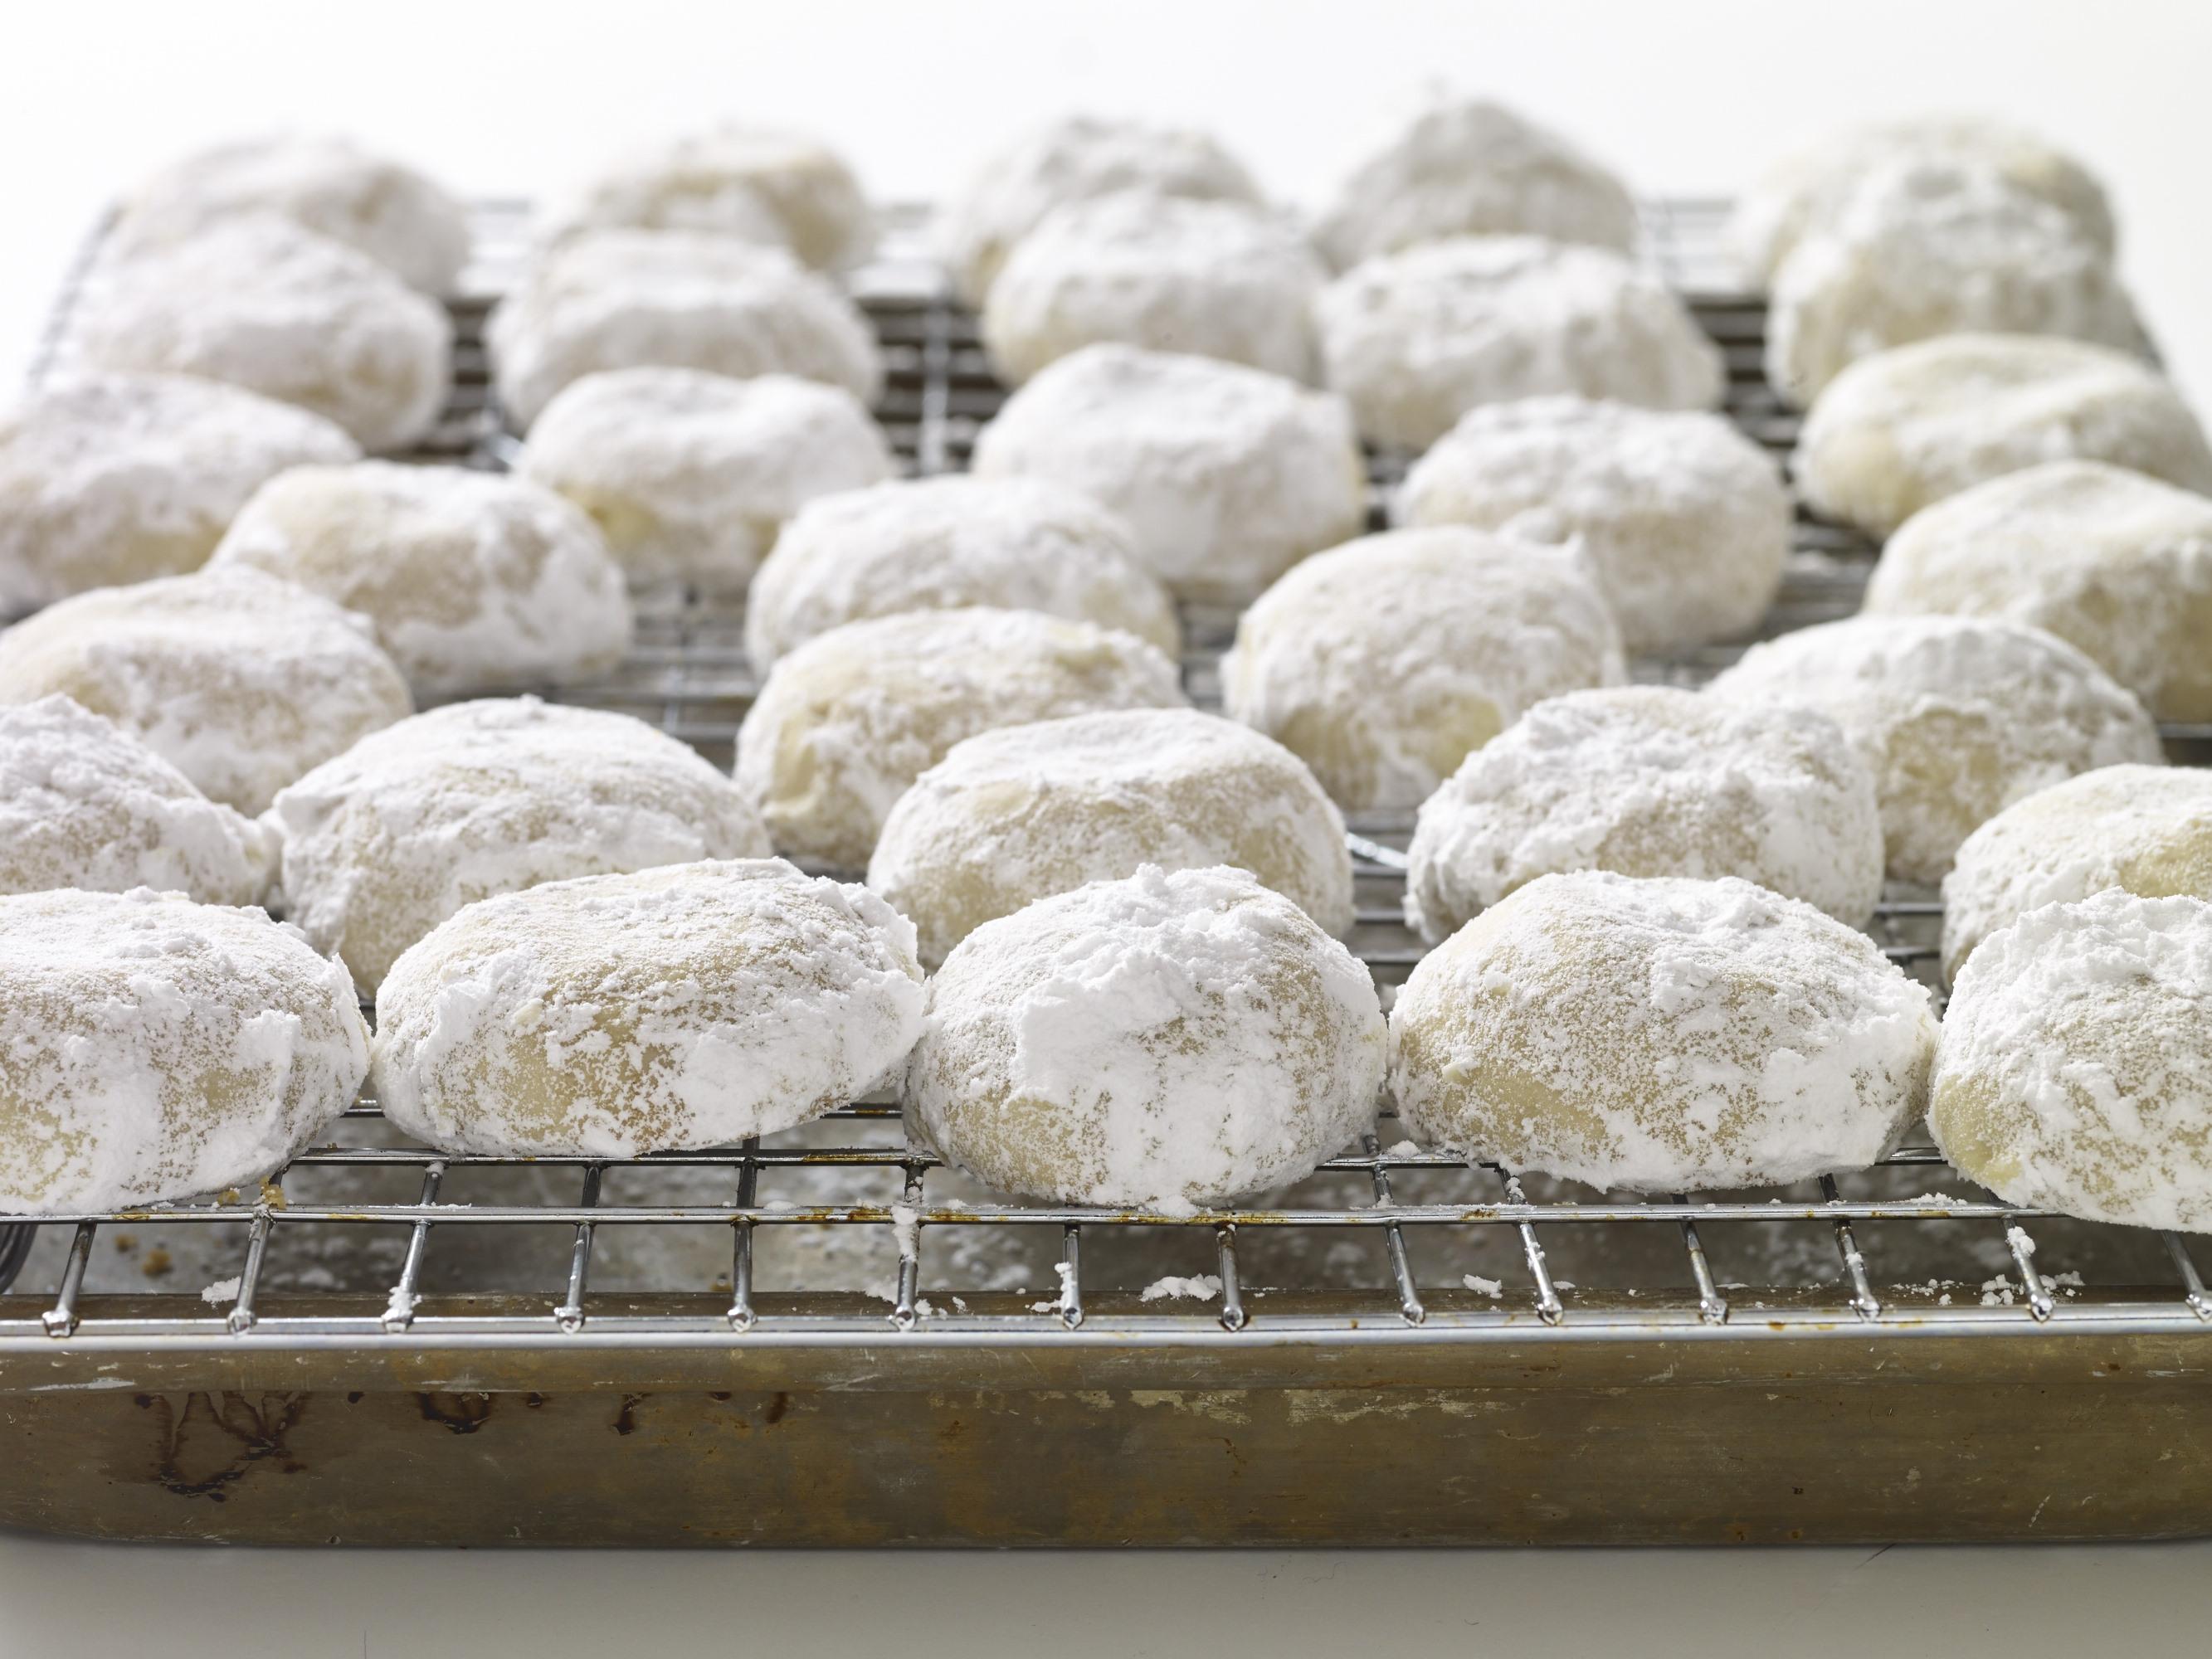 Mexican wedding cookies or polvorones